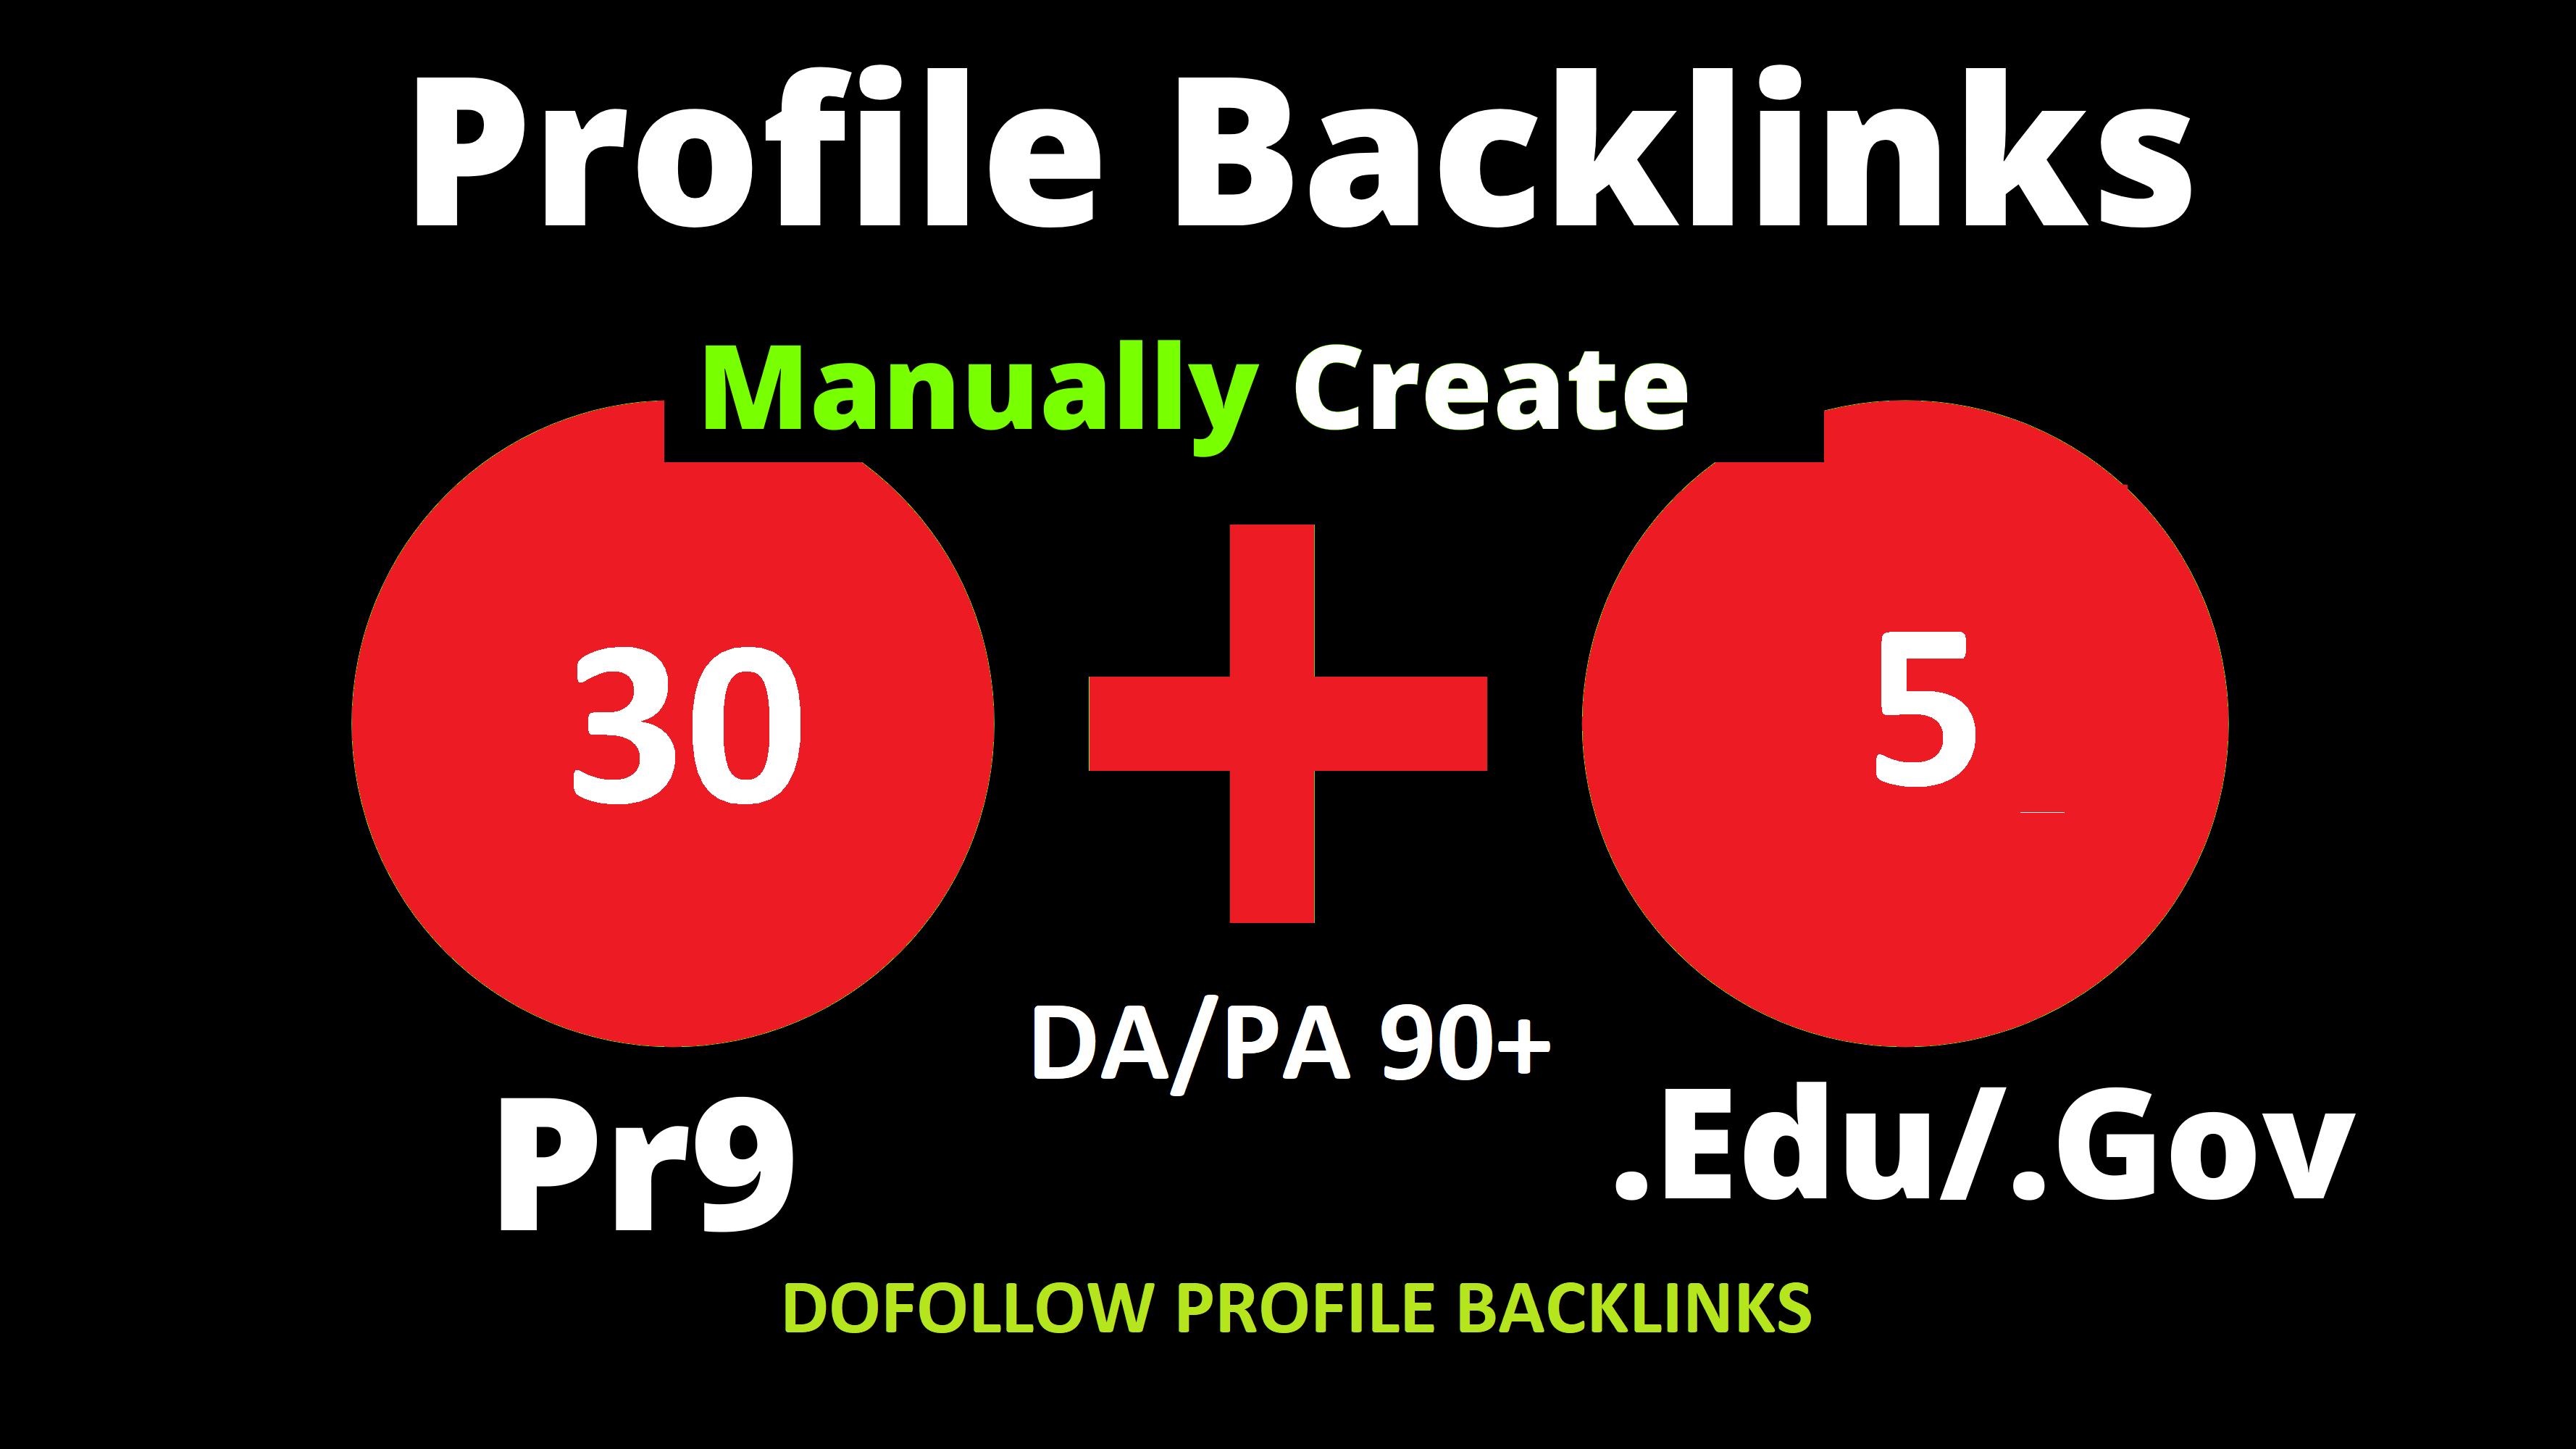 I will Create Manually 30 Pr9 + 5 Edu/Gov Dofollow DA 90+ SEO profile backlinks for website